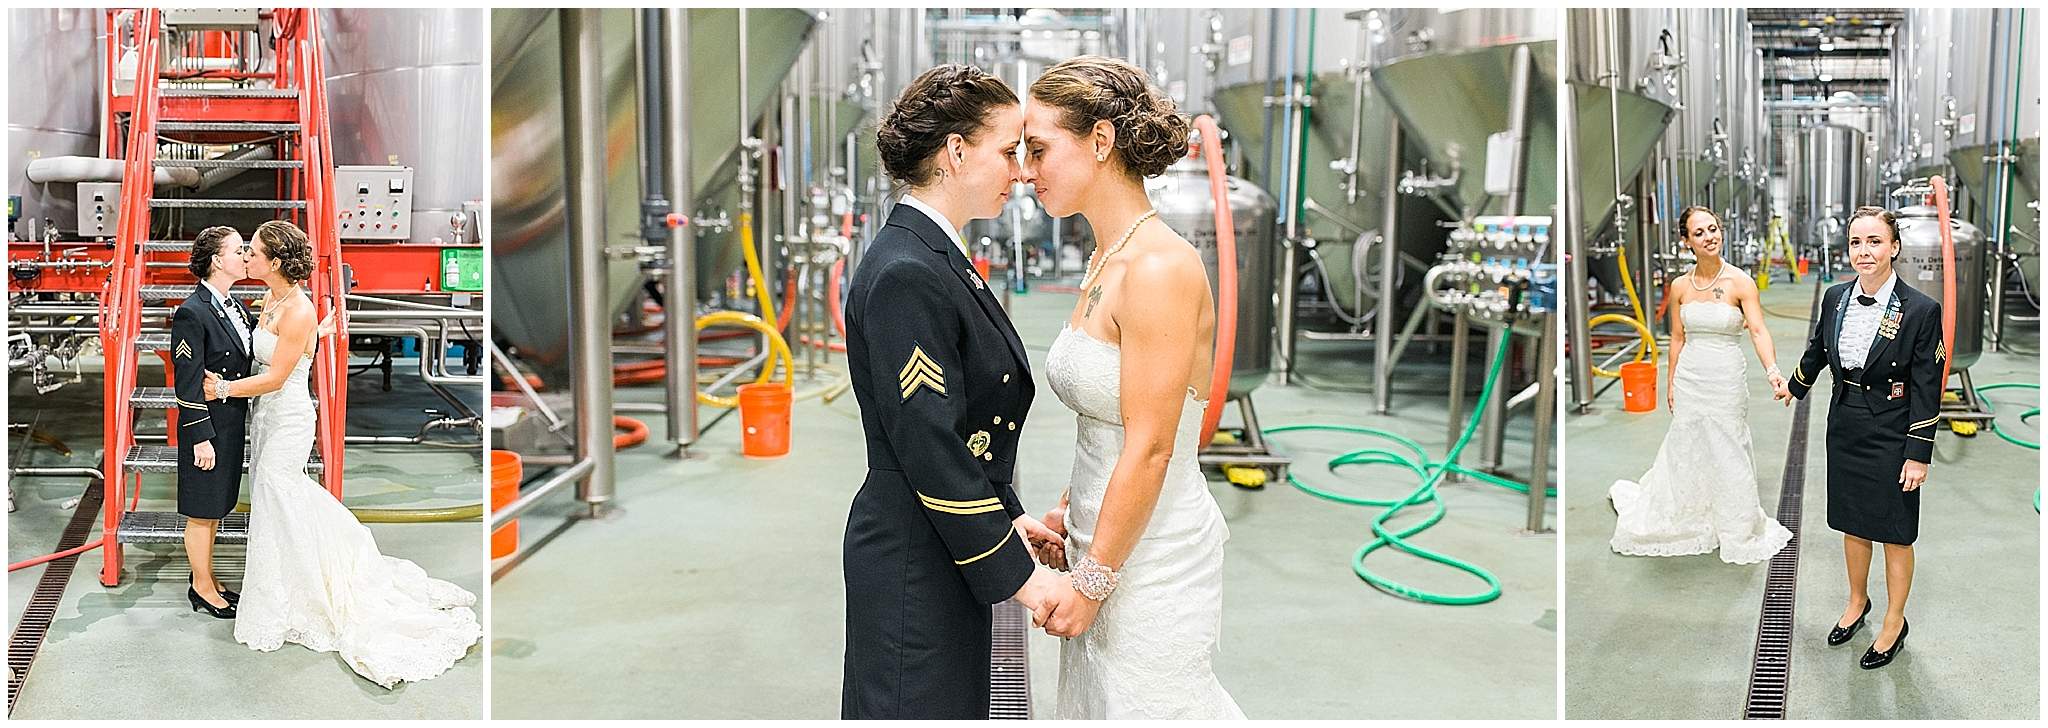 Wedding_Asheville_Highland_Brewing_Photographer_9.jpg